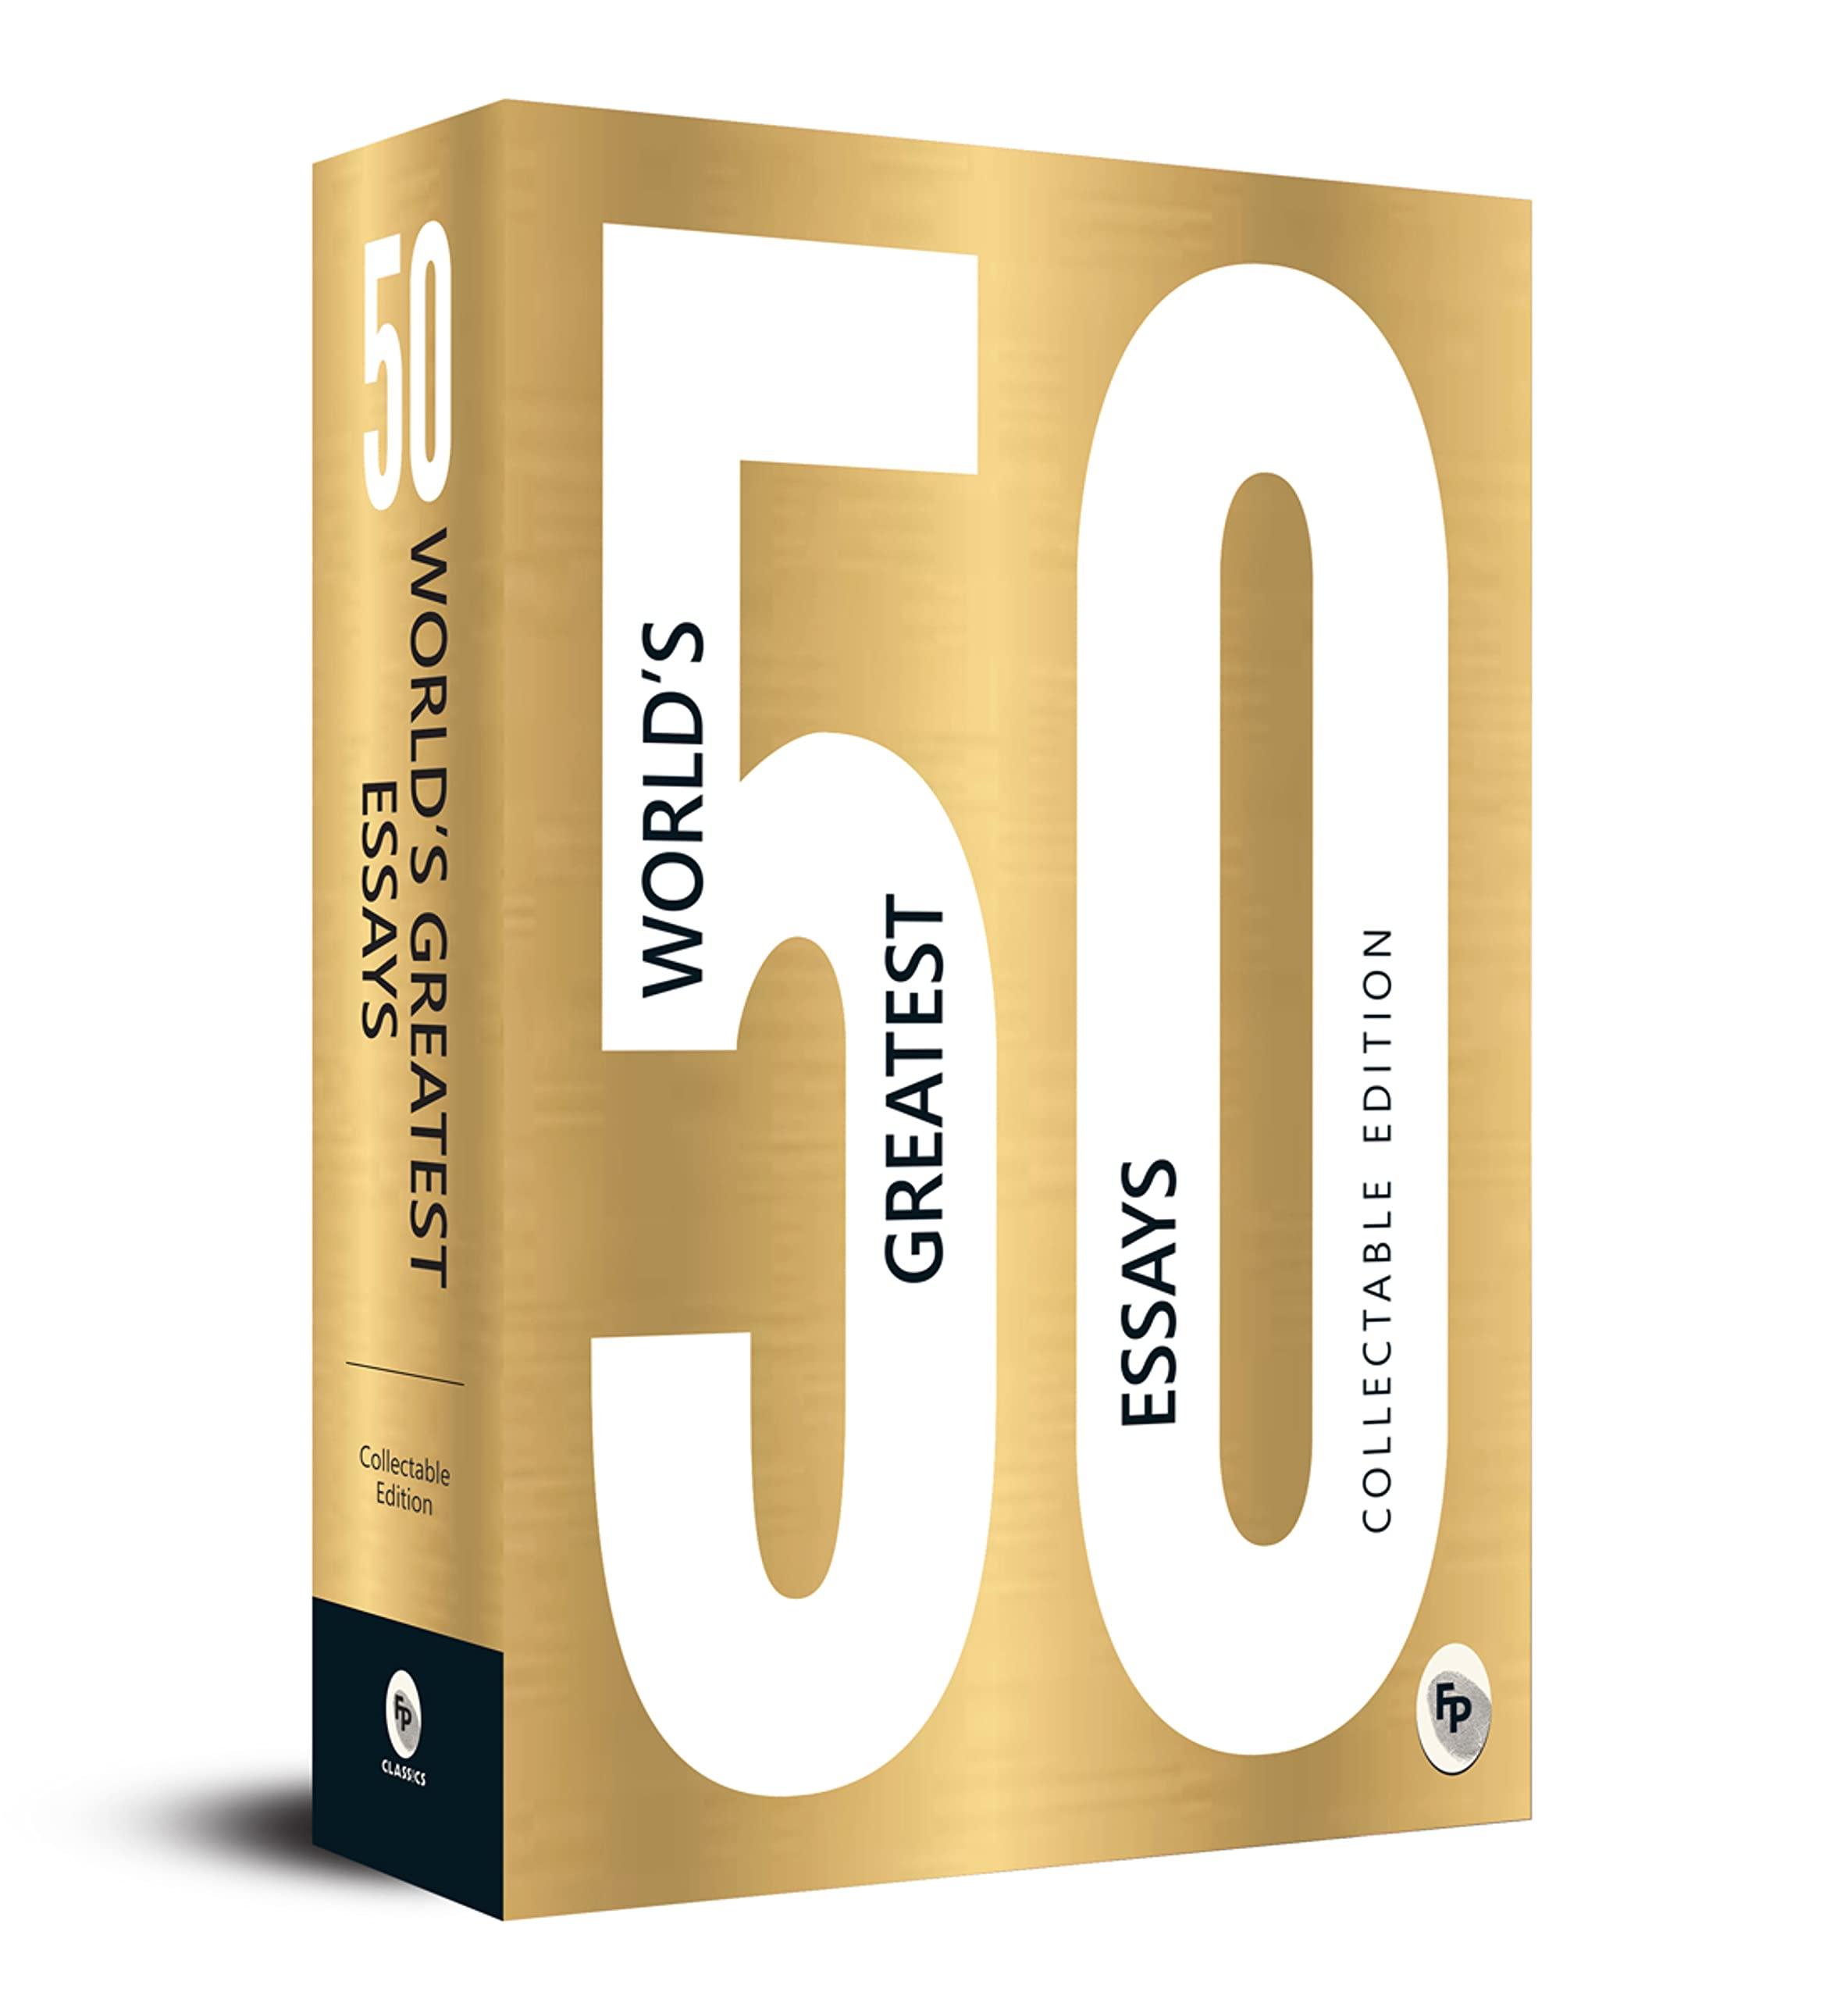 50 great essays popular university cheap essay samples